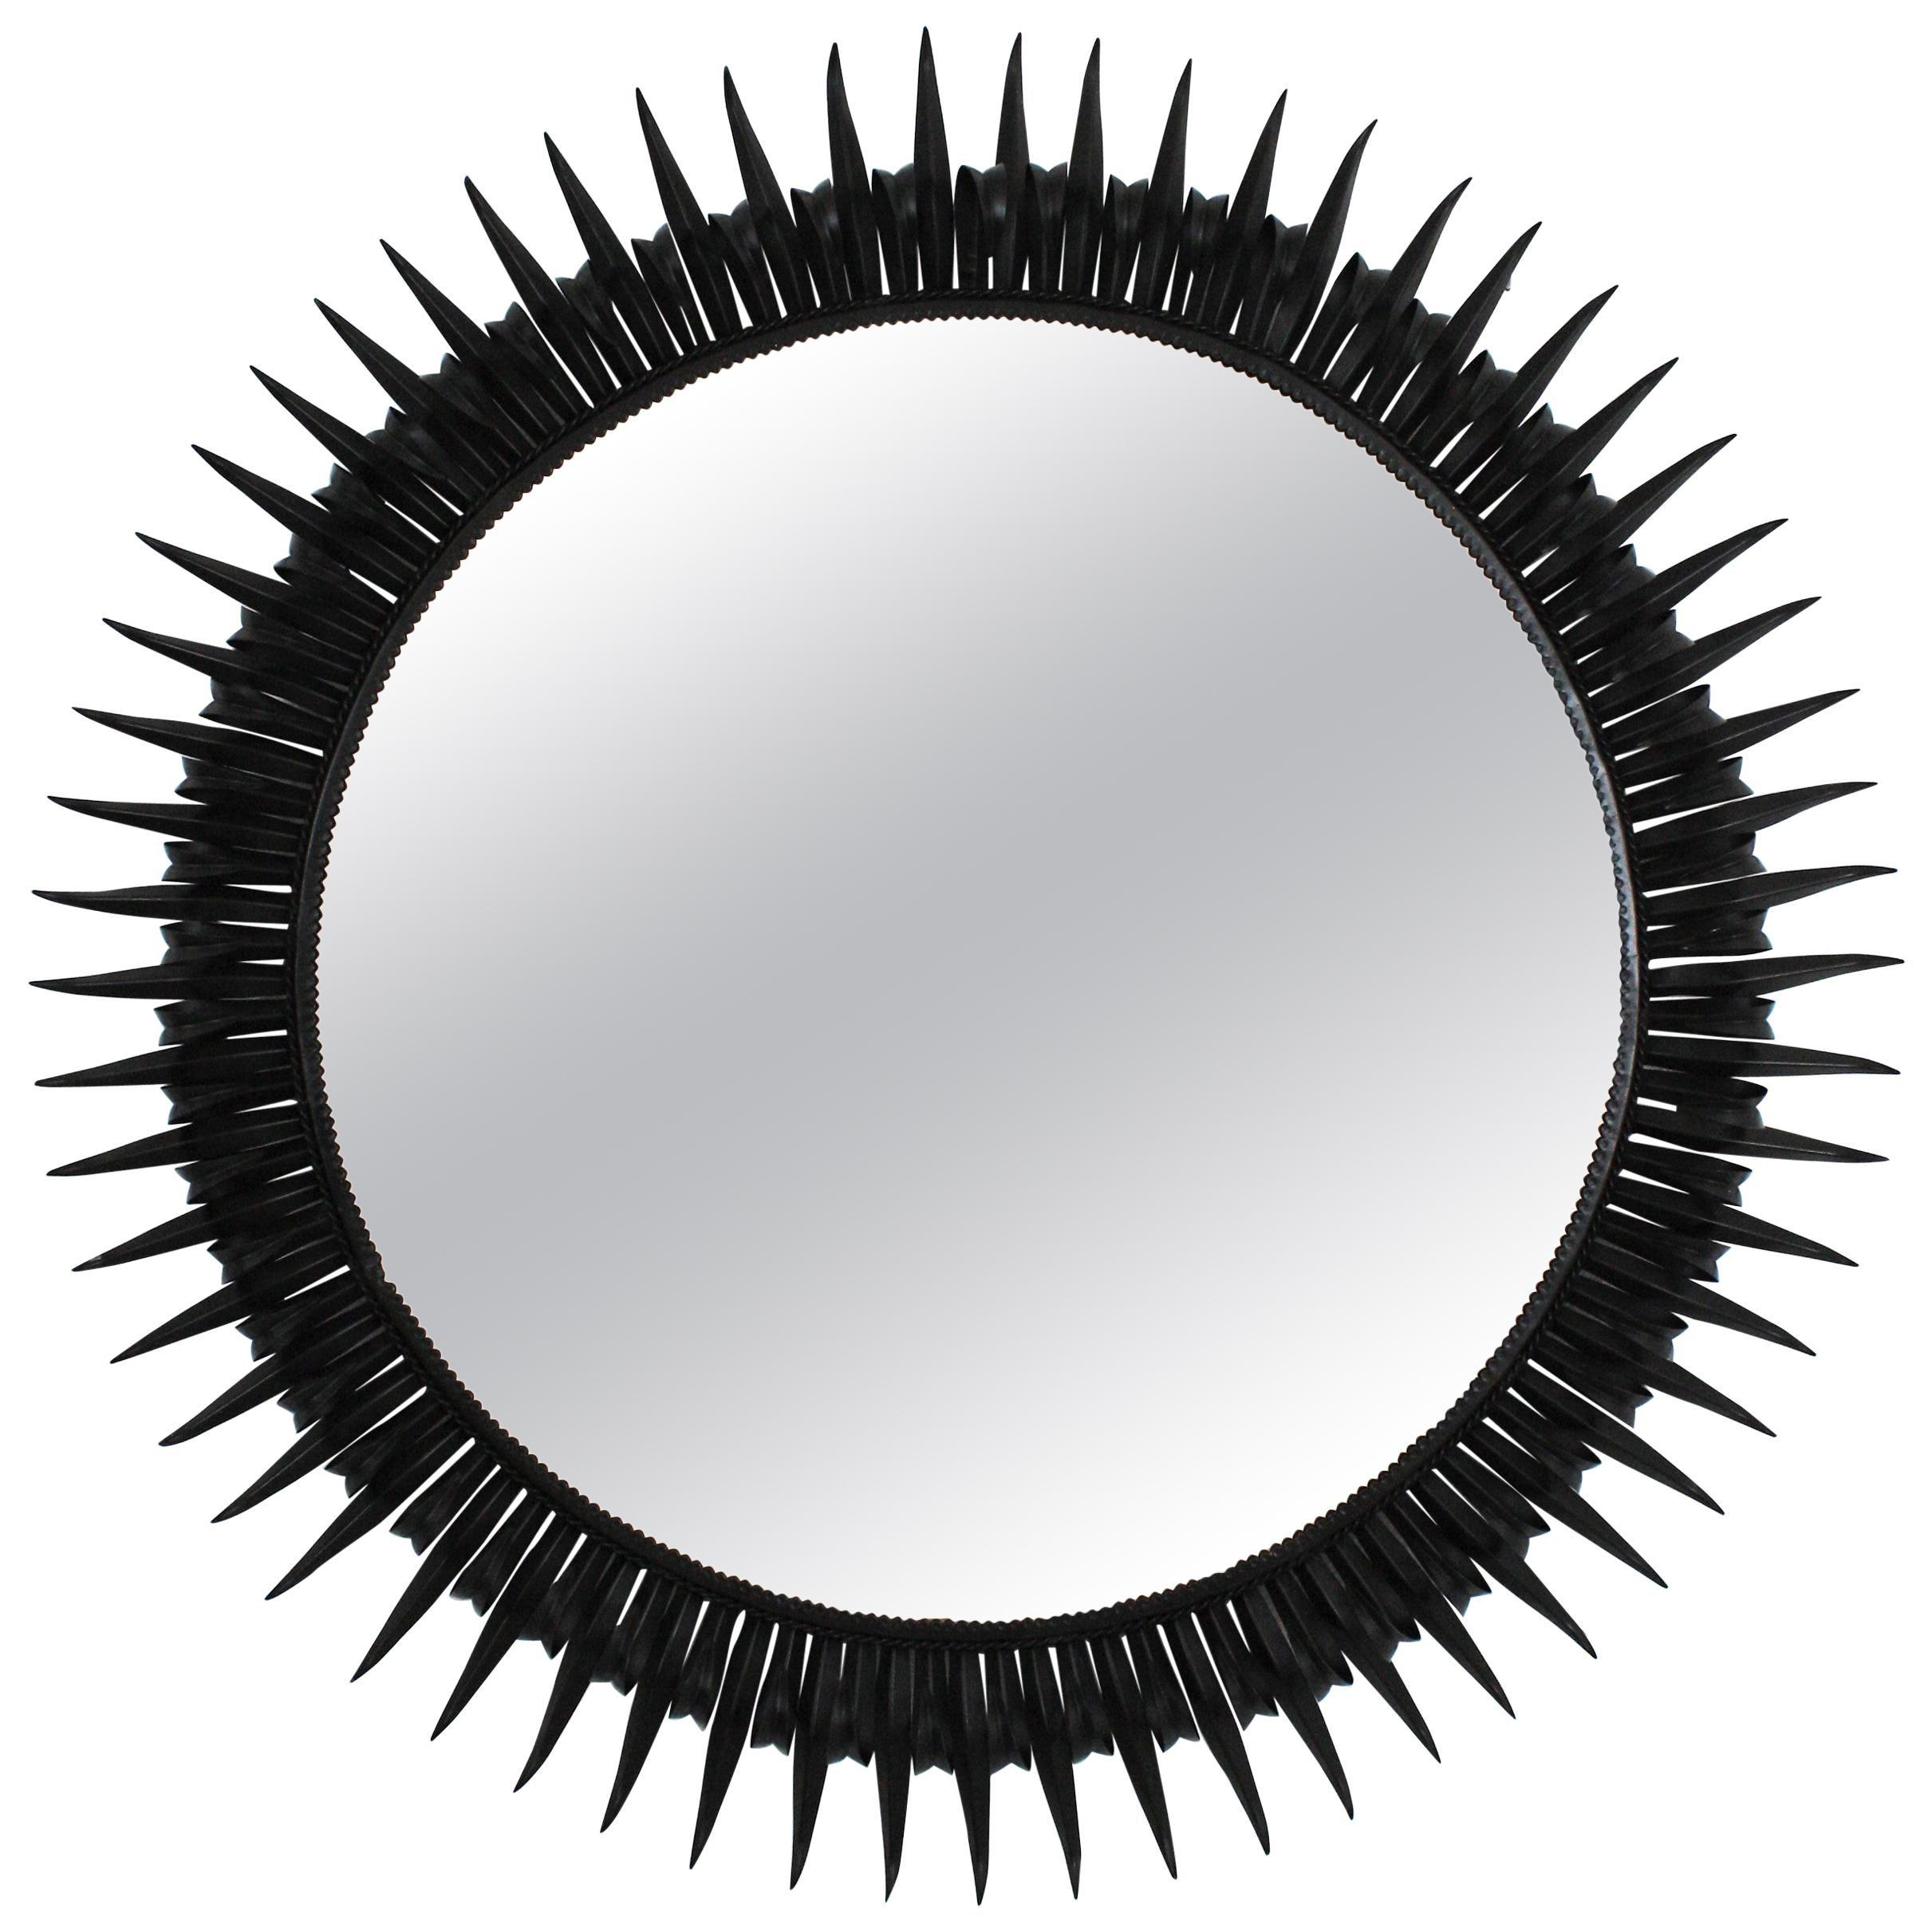 Sunburst Eyelash Mirror in Black Wrought Iron